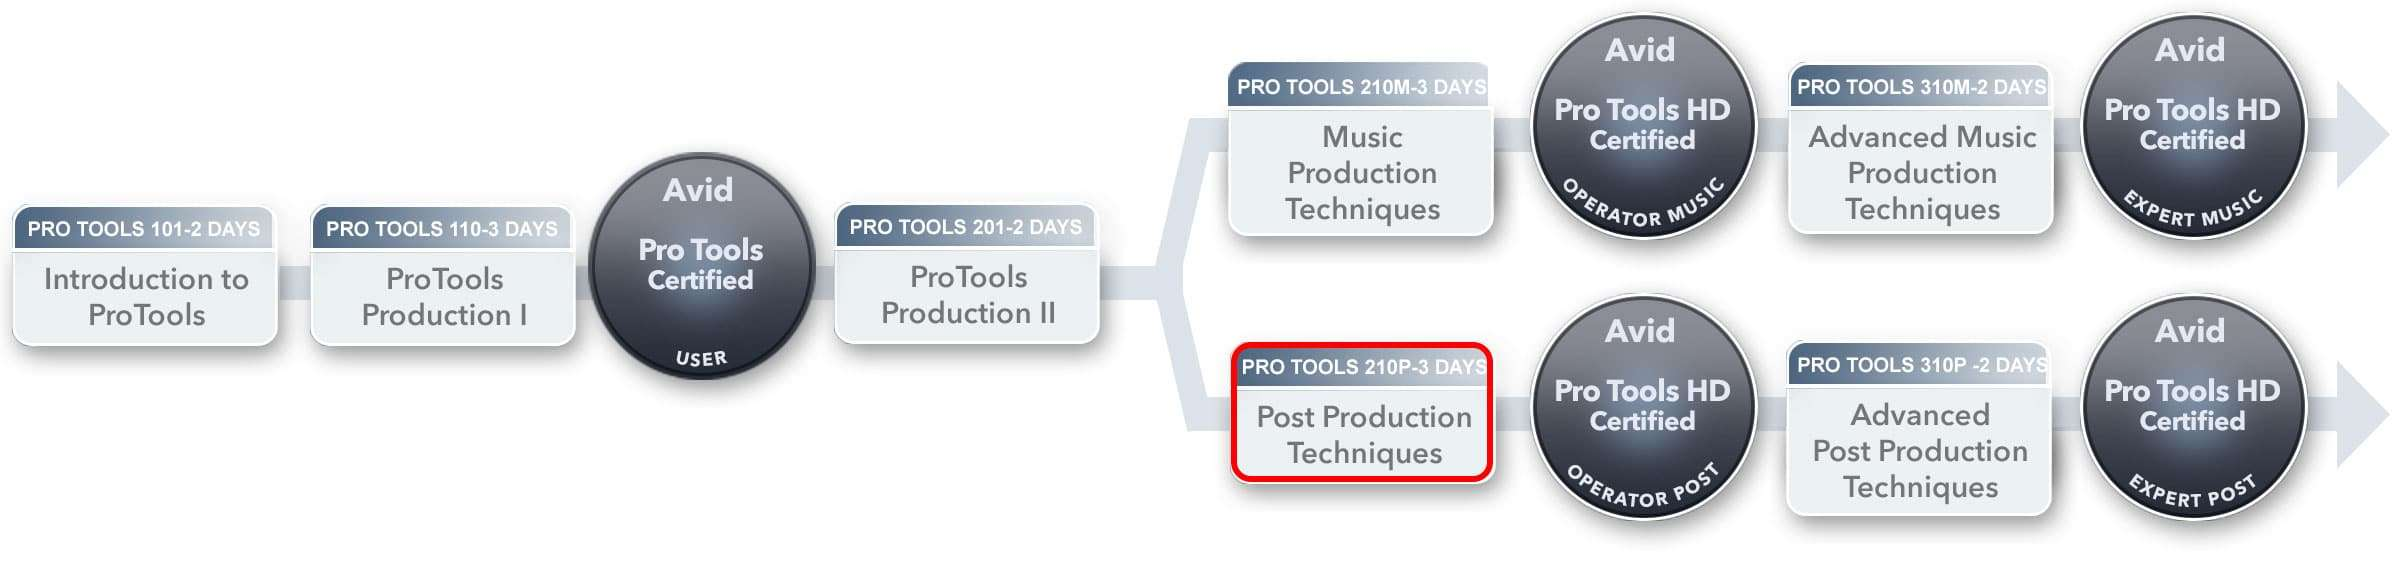 Pro-Tools-path-210P-12